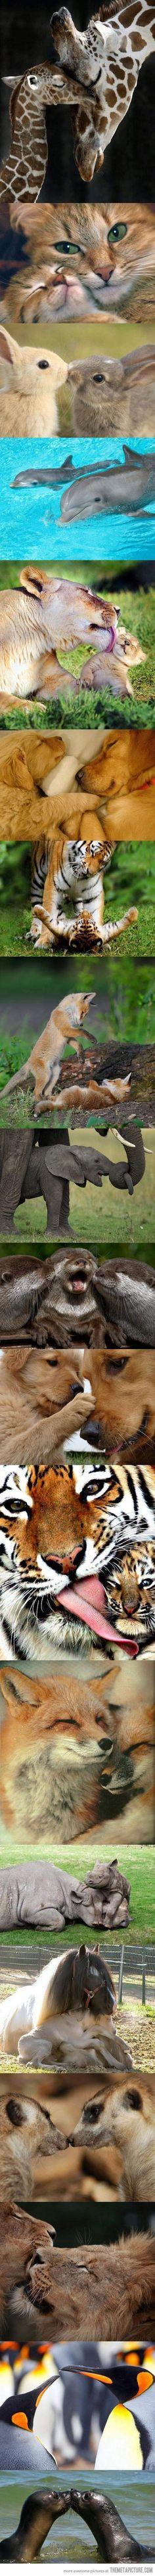 Animal kingdom kisses…